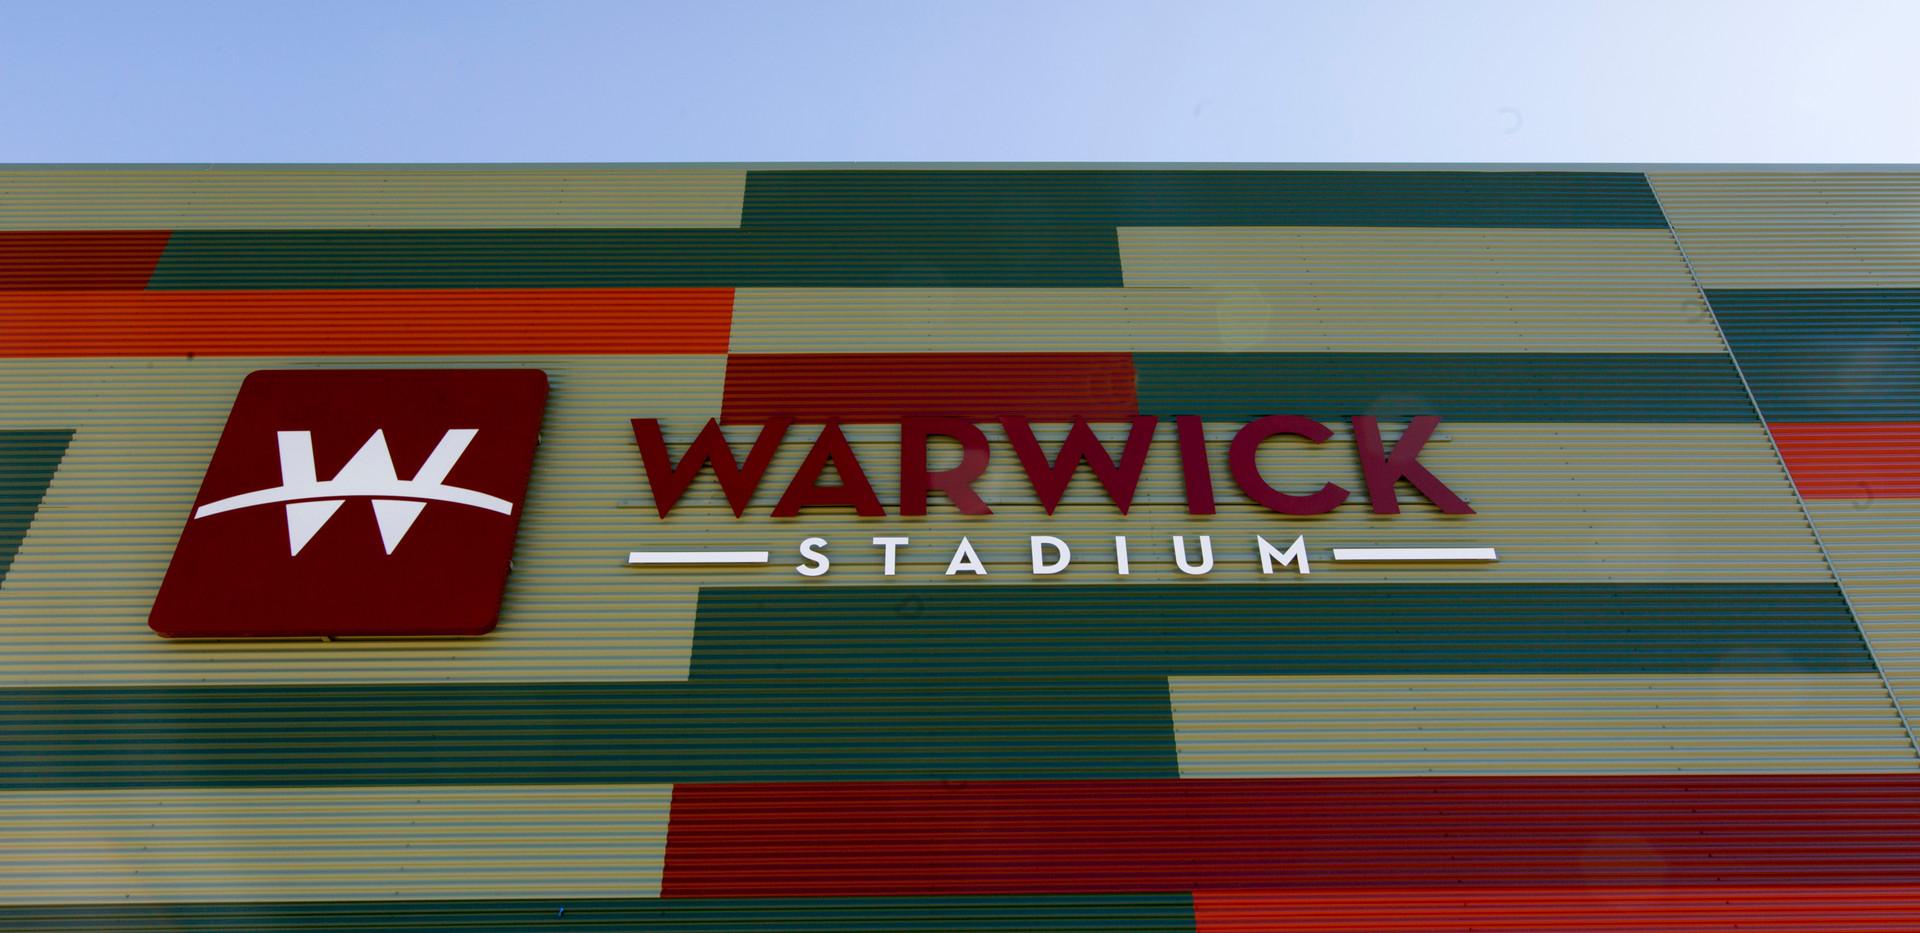 Rivett_Warwick Stadium_25.jpg